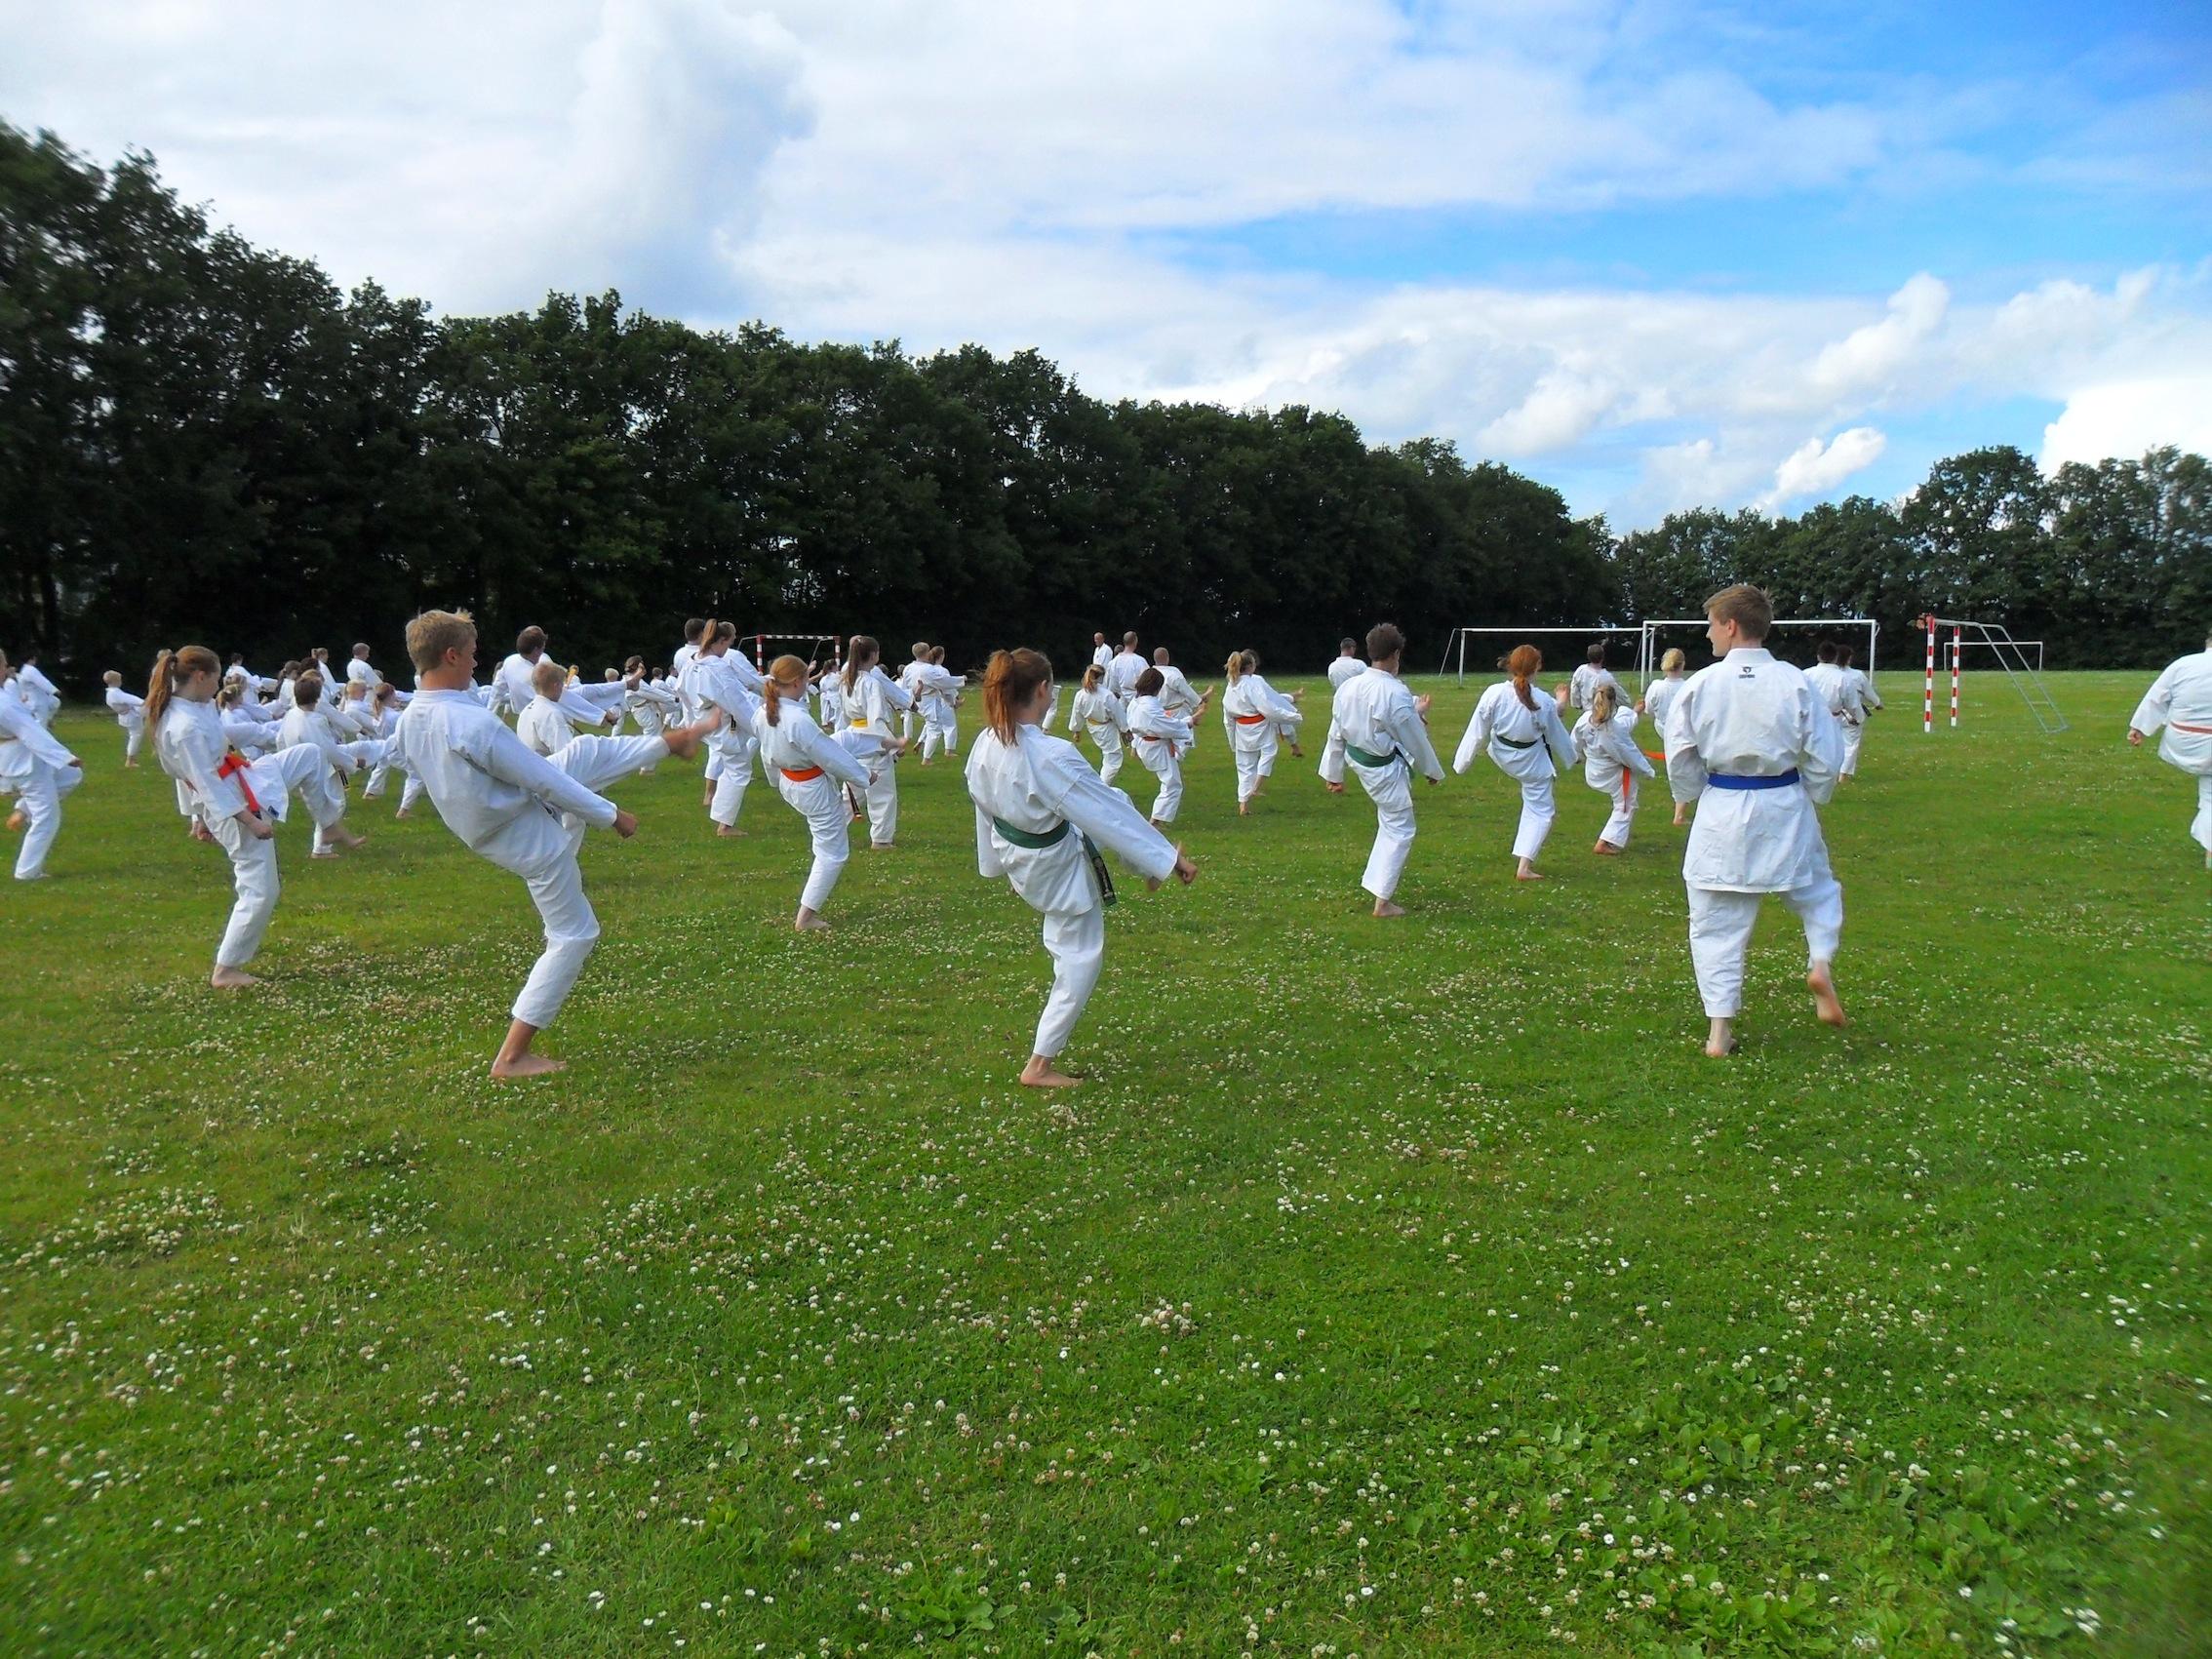 Sommerlejr 2011- Egedal Karate Klub